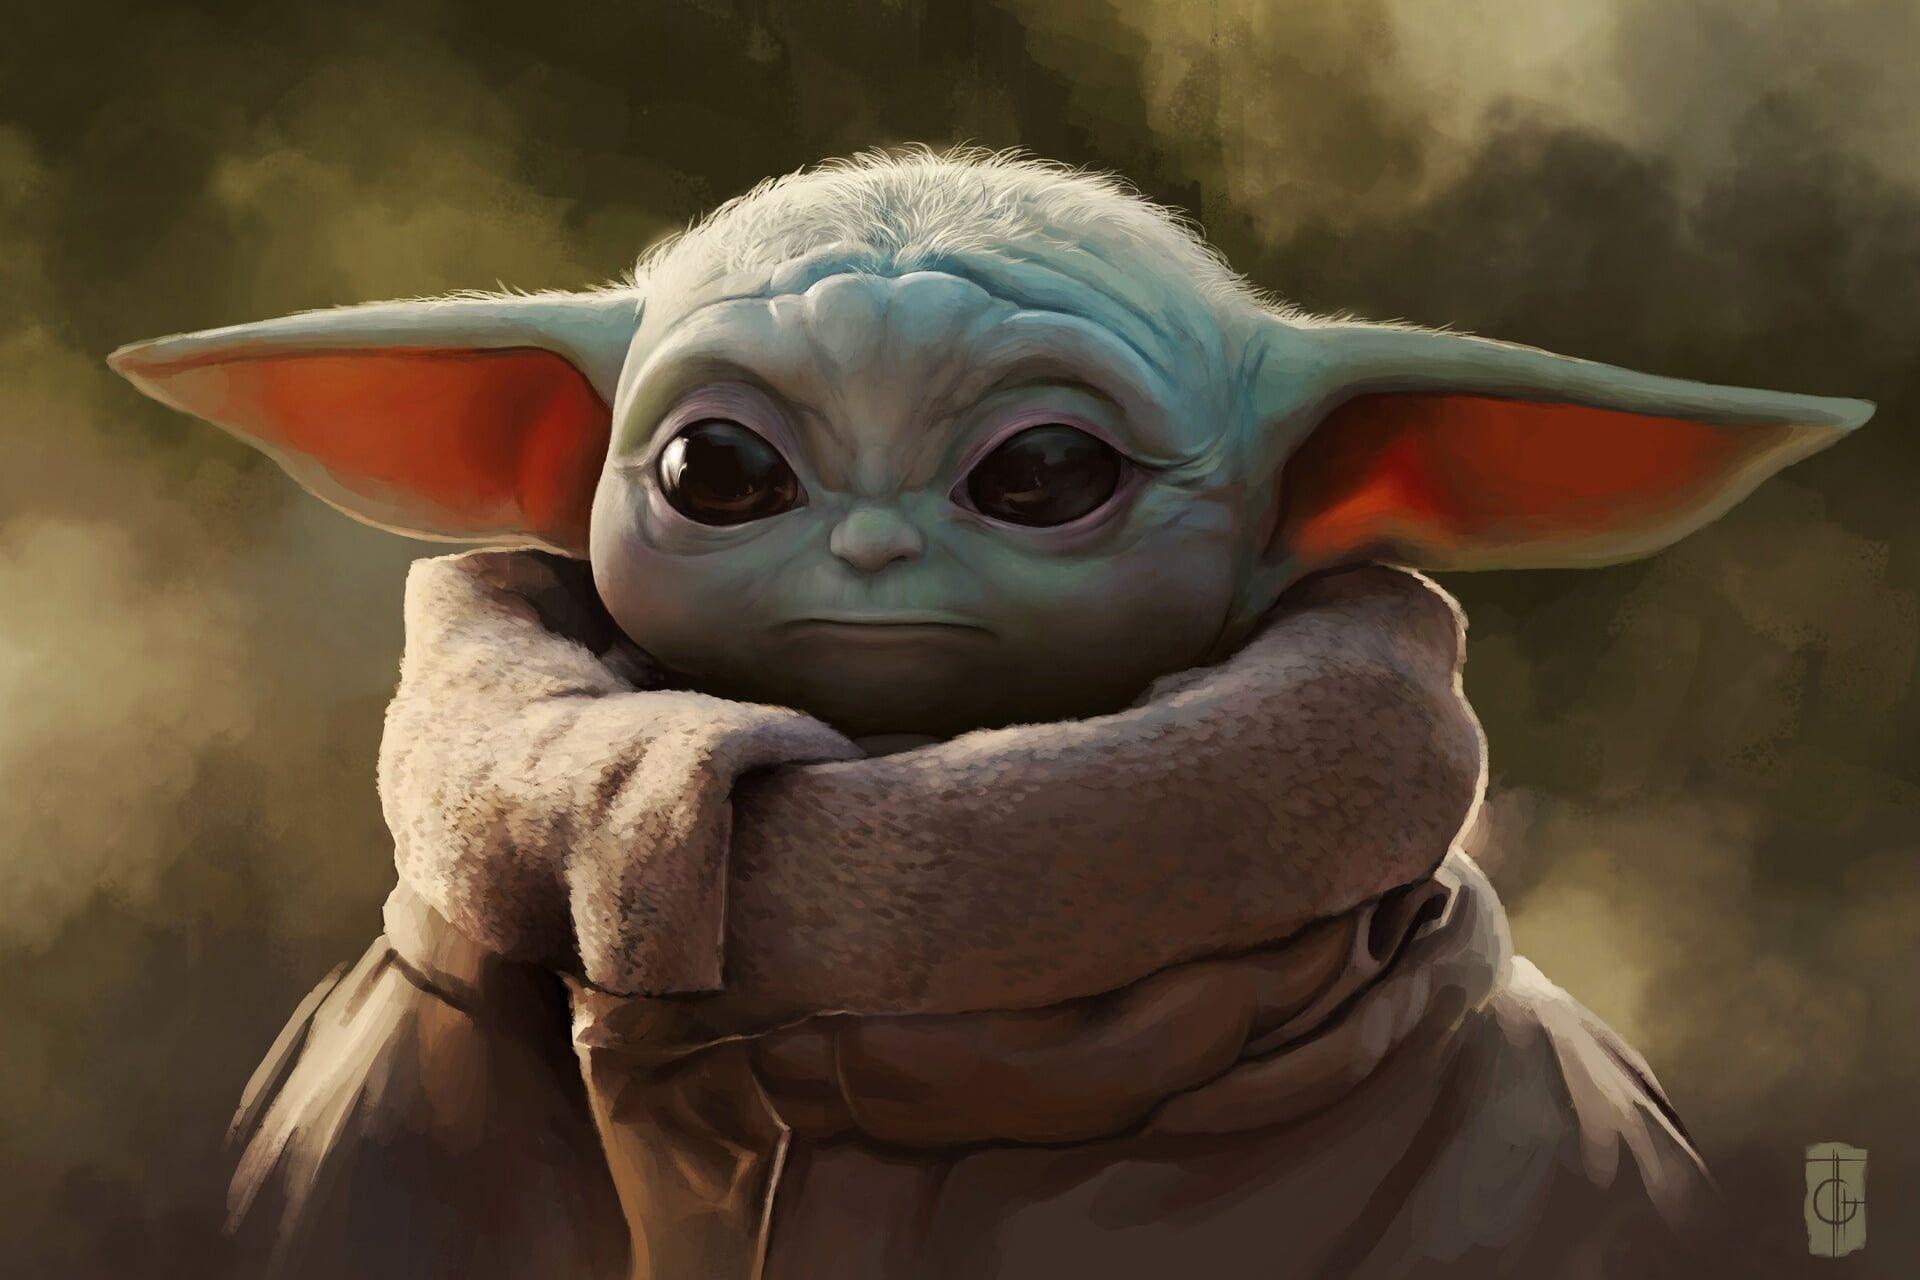 Star Wars Artwork The Mandalorian Baby Yoda 1080p Wallpaper Hdwallpaper Desktop In 2020 Star Wars Pictures Star Wars Images Yoda Wallpaper